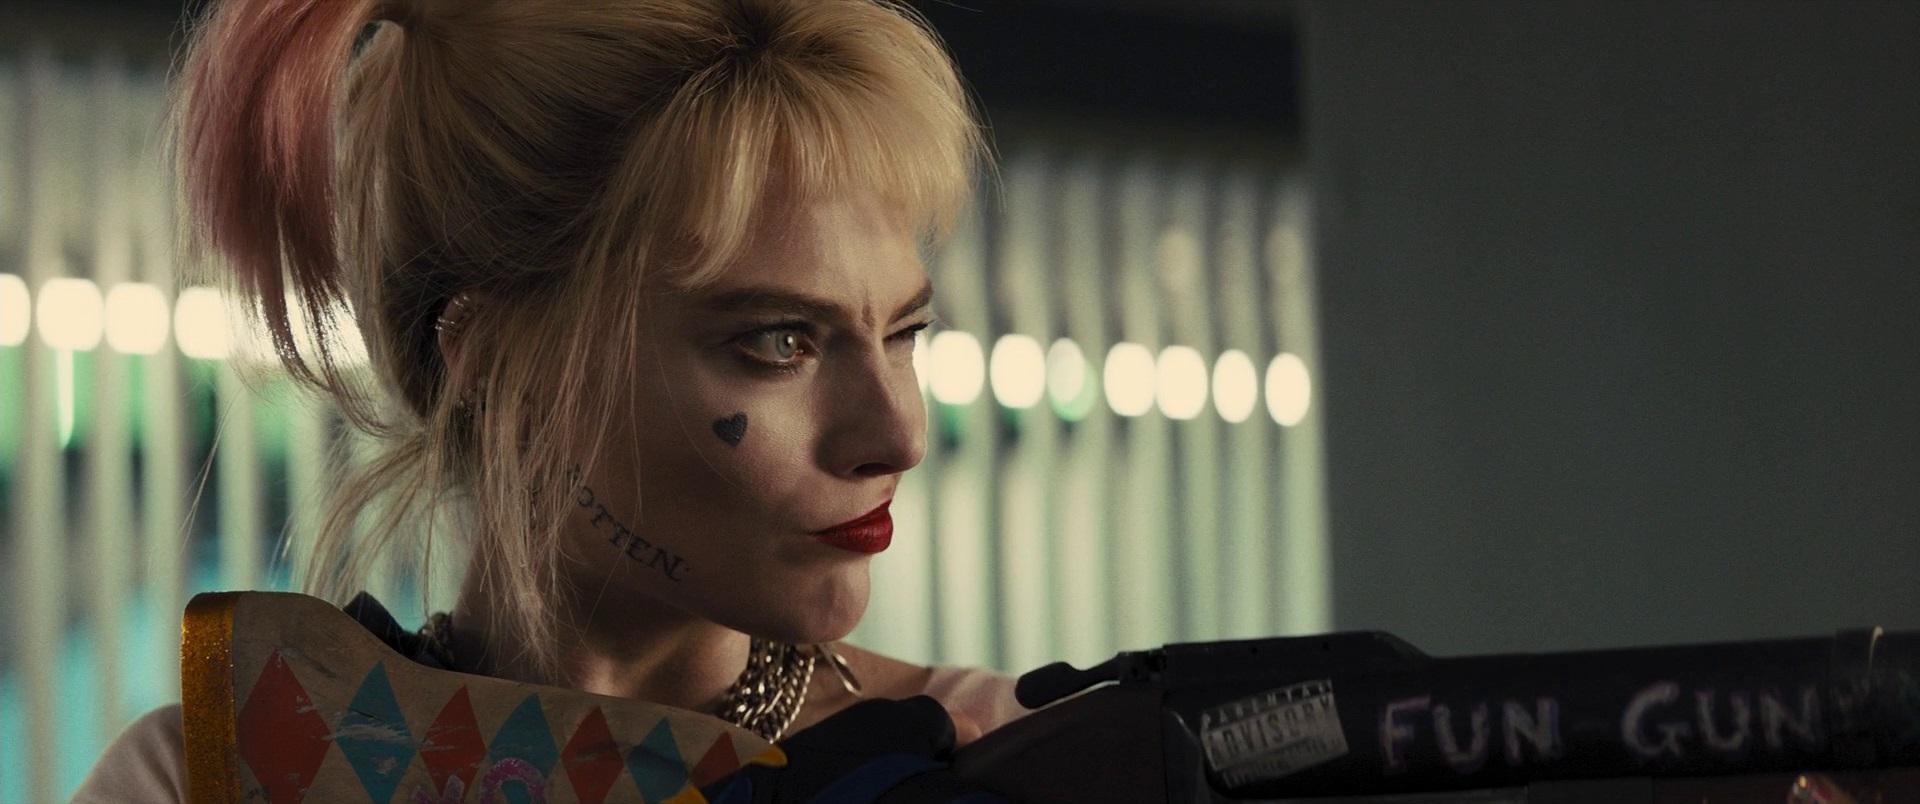 Yırtıcı Kuşlar ve Muhteşem Harley Quinn | 2020 | BDRip | XviD | Türkçe Dublaj | m720p - m1080p | BluRay | Dual | TR-EN | Tek Link